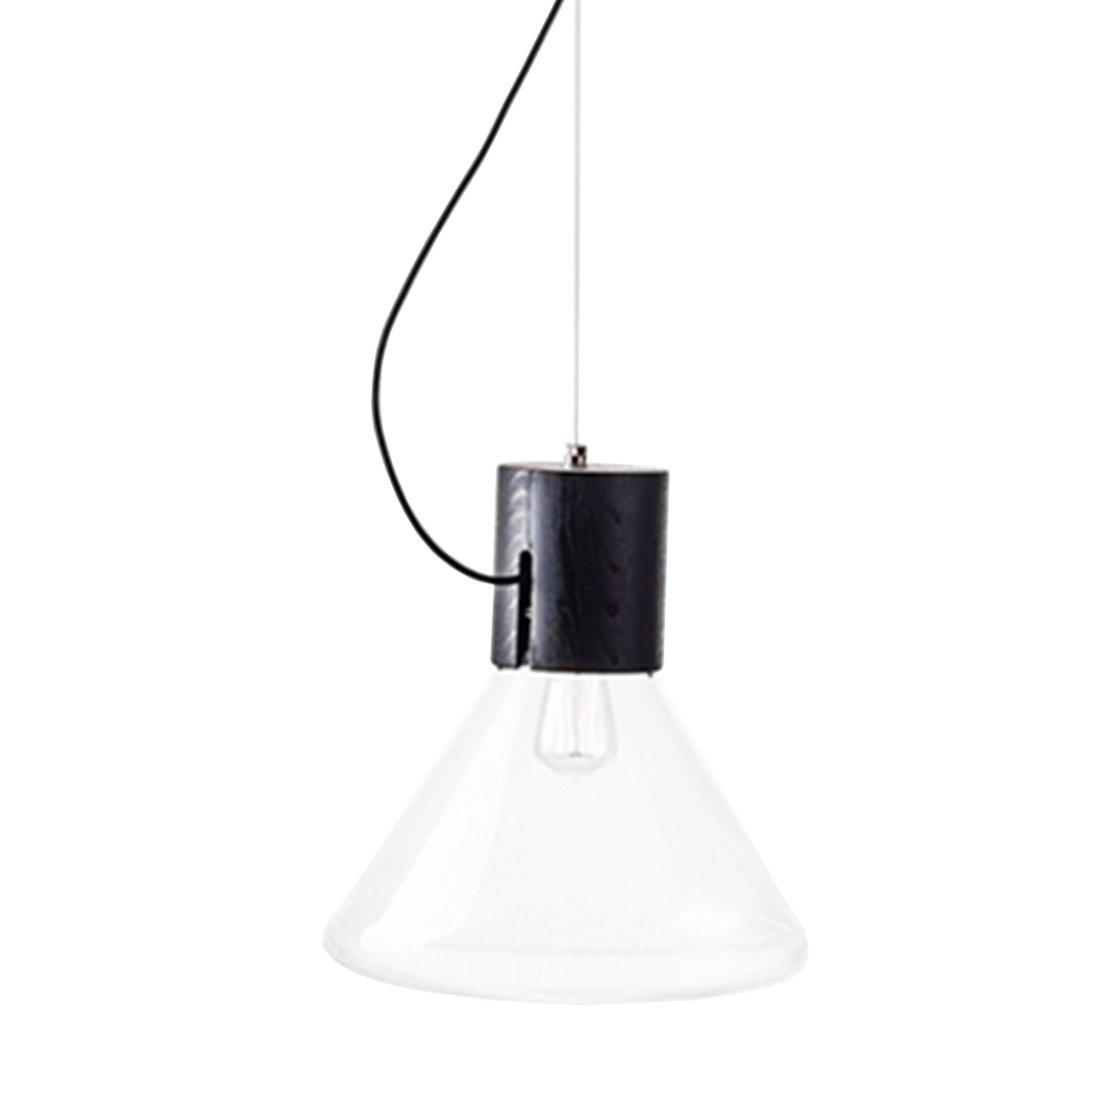 Brokis Muffin Hanglamp Small Transparant - Zwart Eiken Body